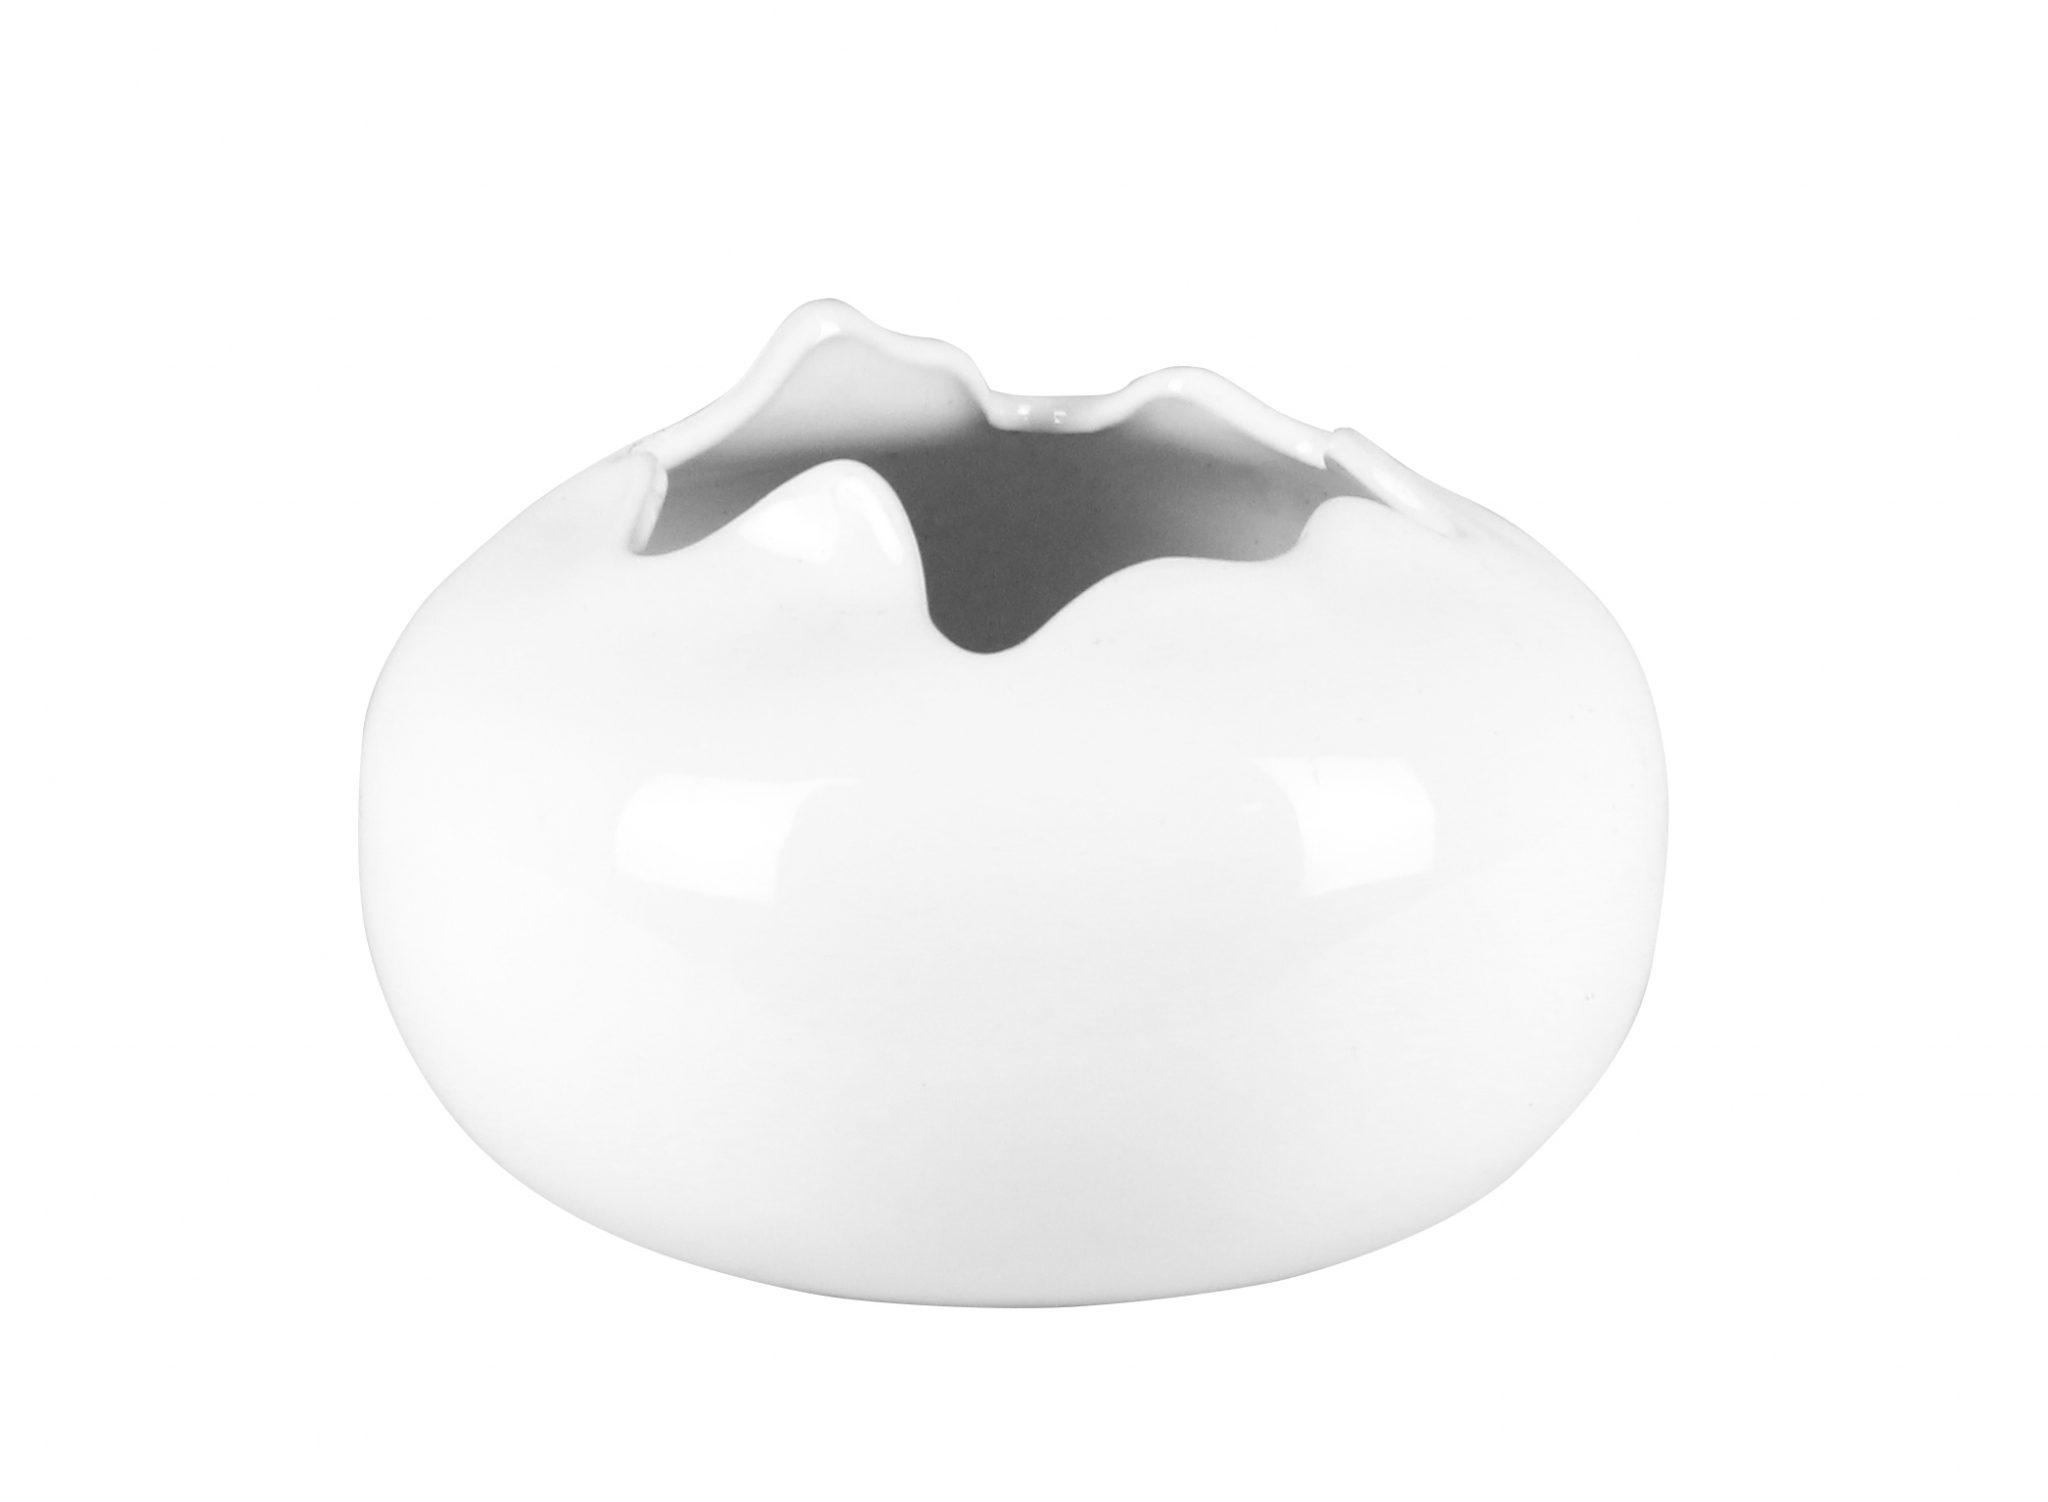 Cracked Egg Fwr Rental Haus